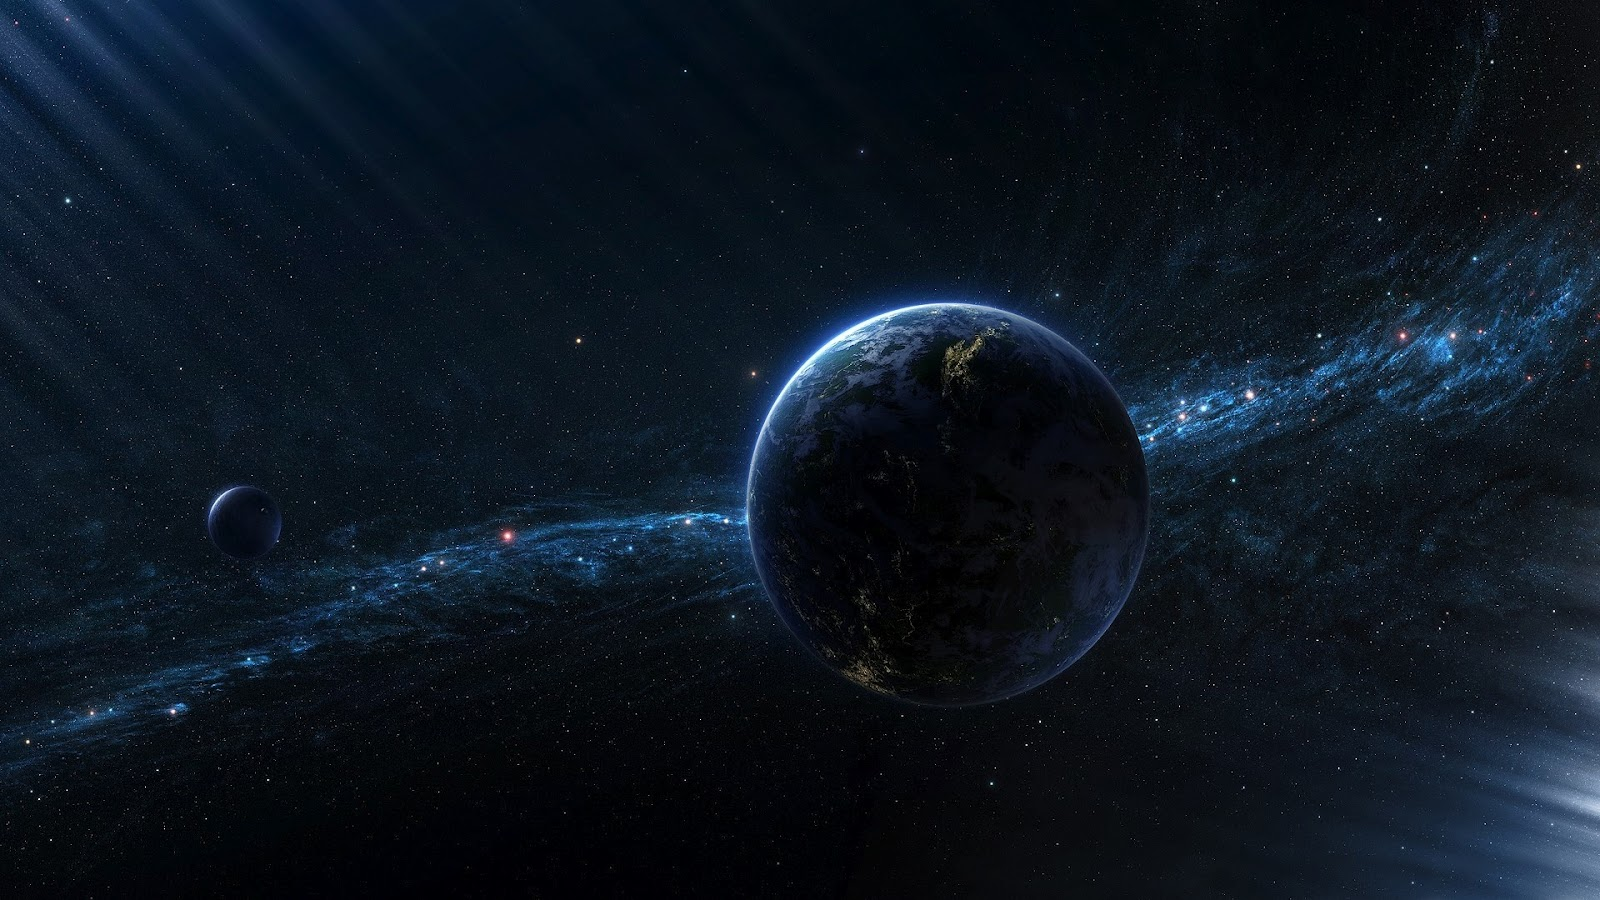 earth wallpaper hd 1080p - photo #23